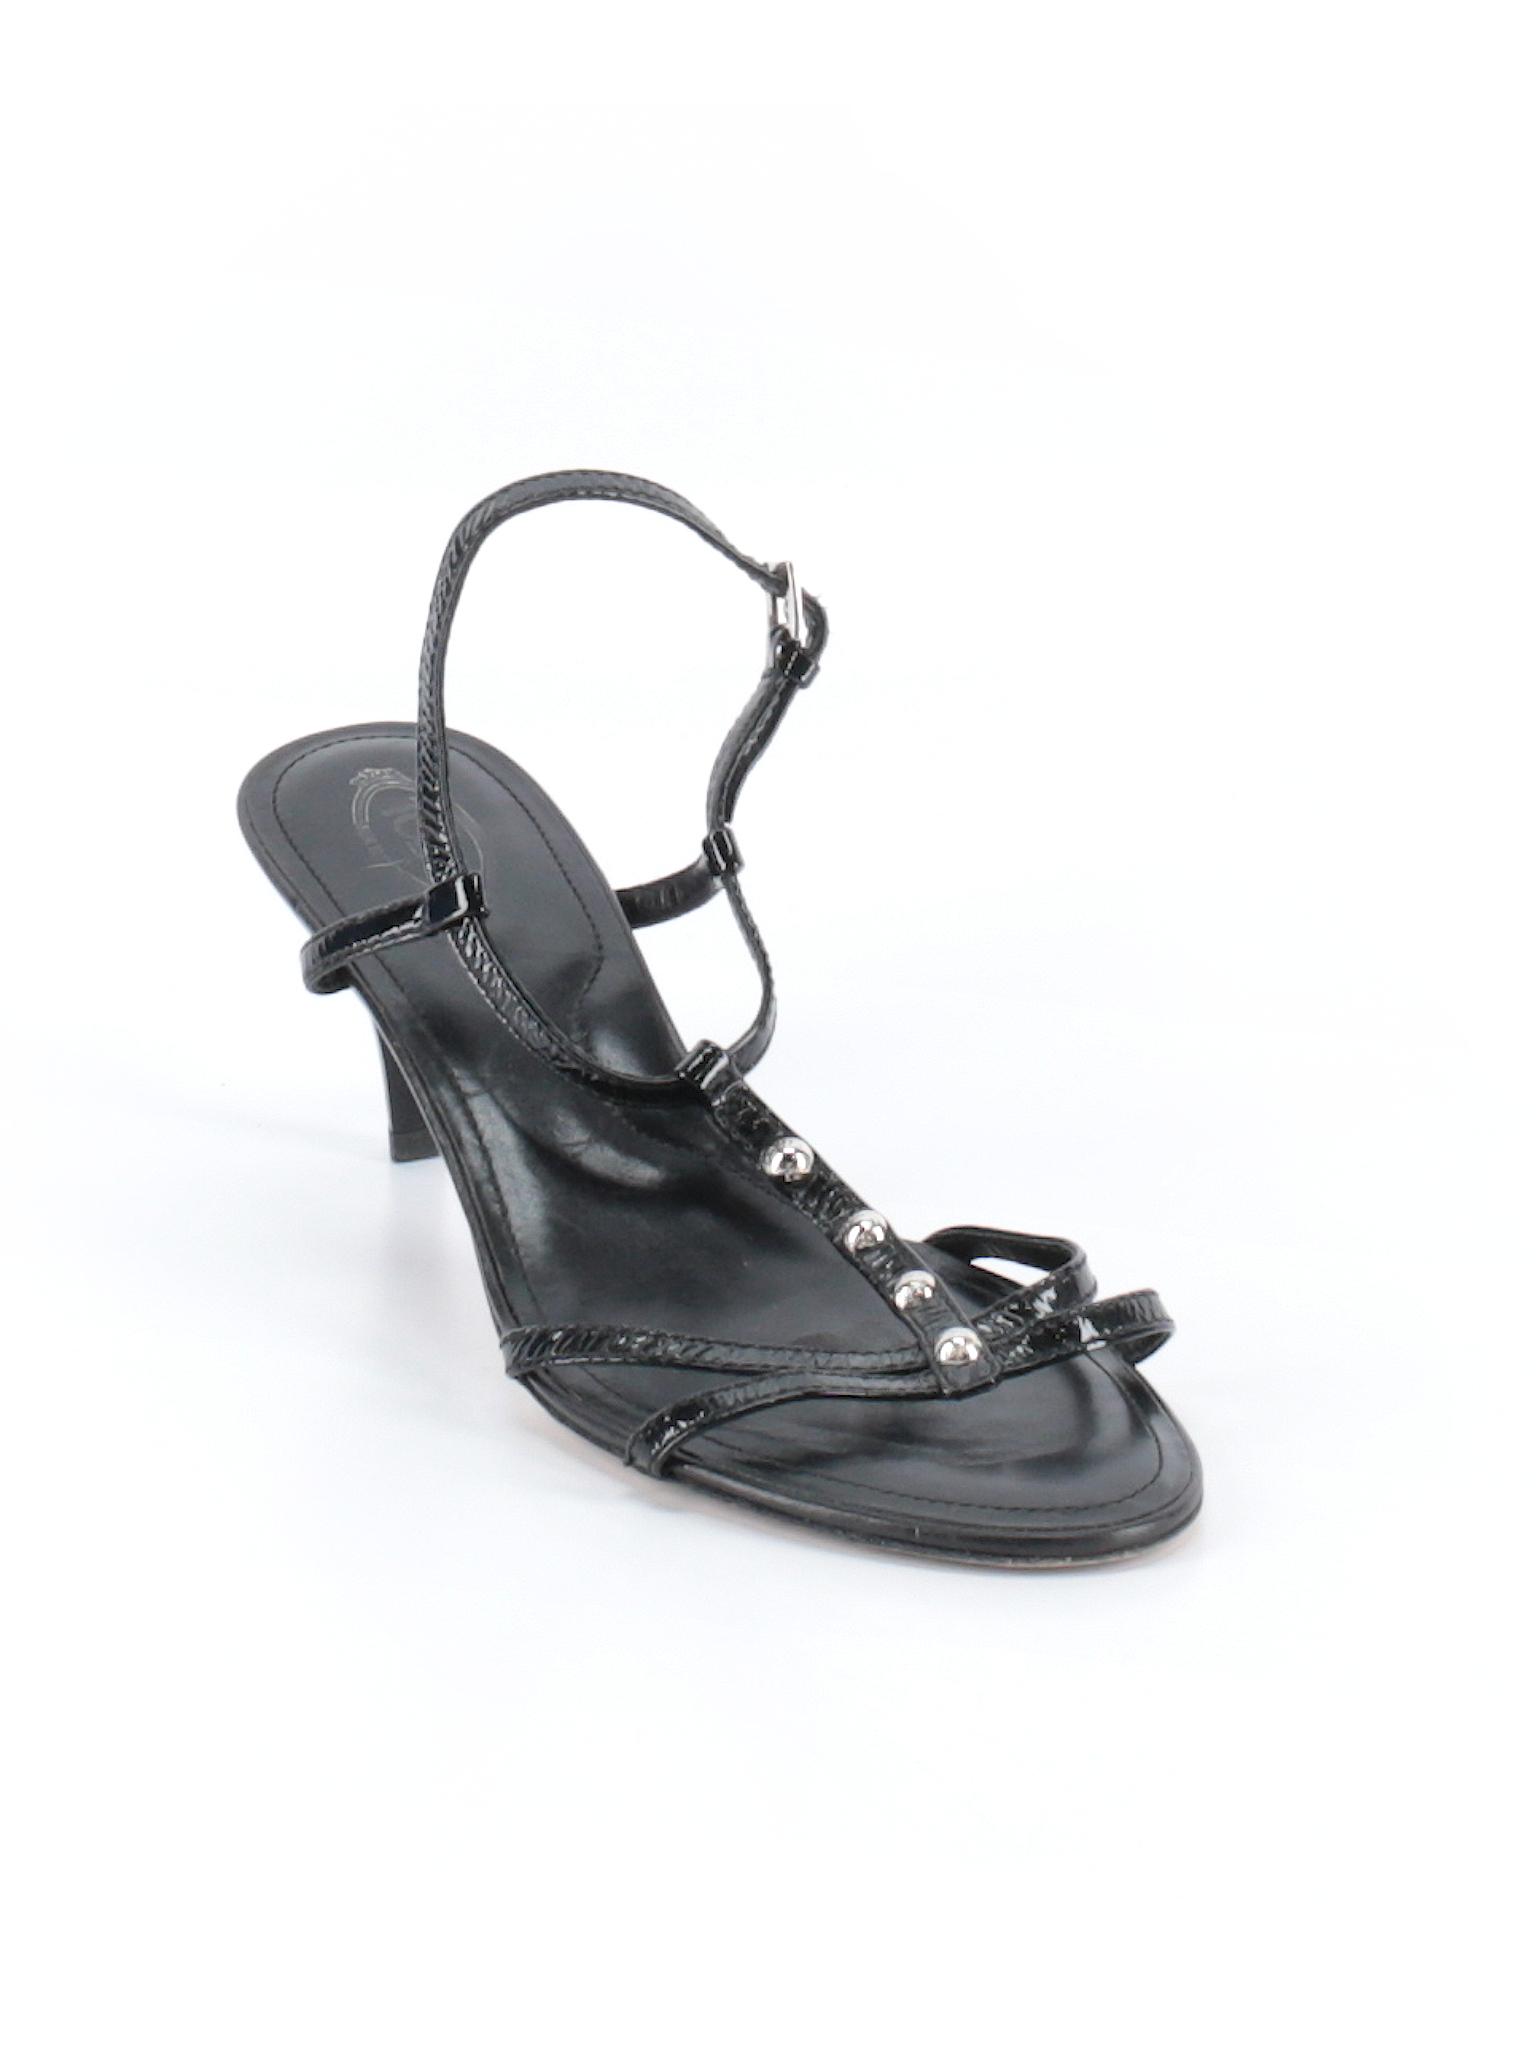 Boutique Tod's promotion Boutique Heels promotion Heels Tod's w1wBOq0x